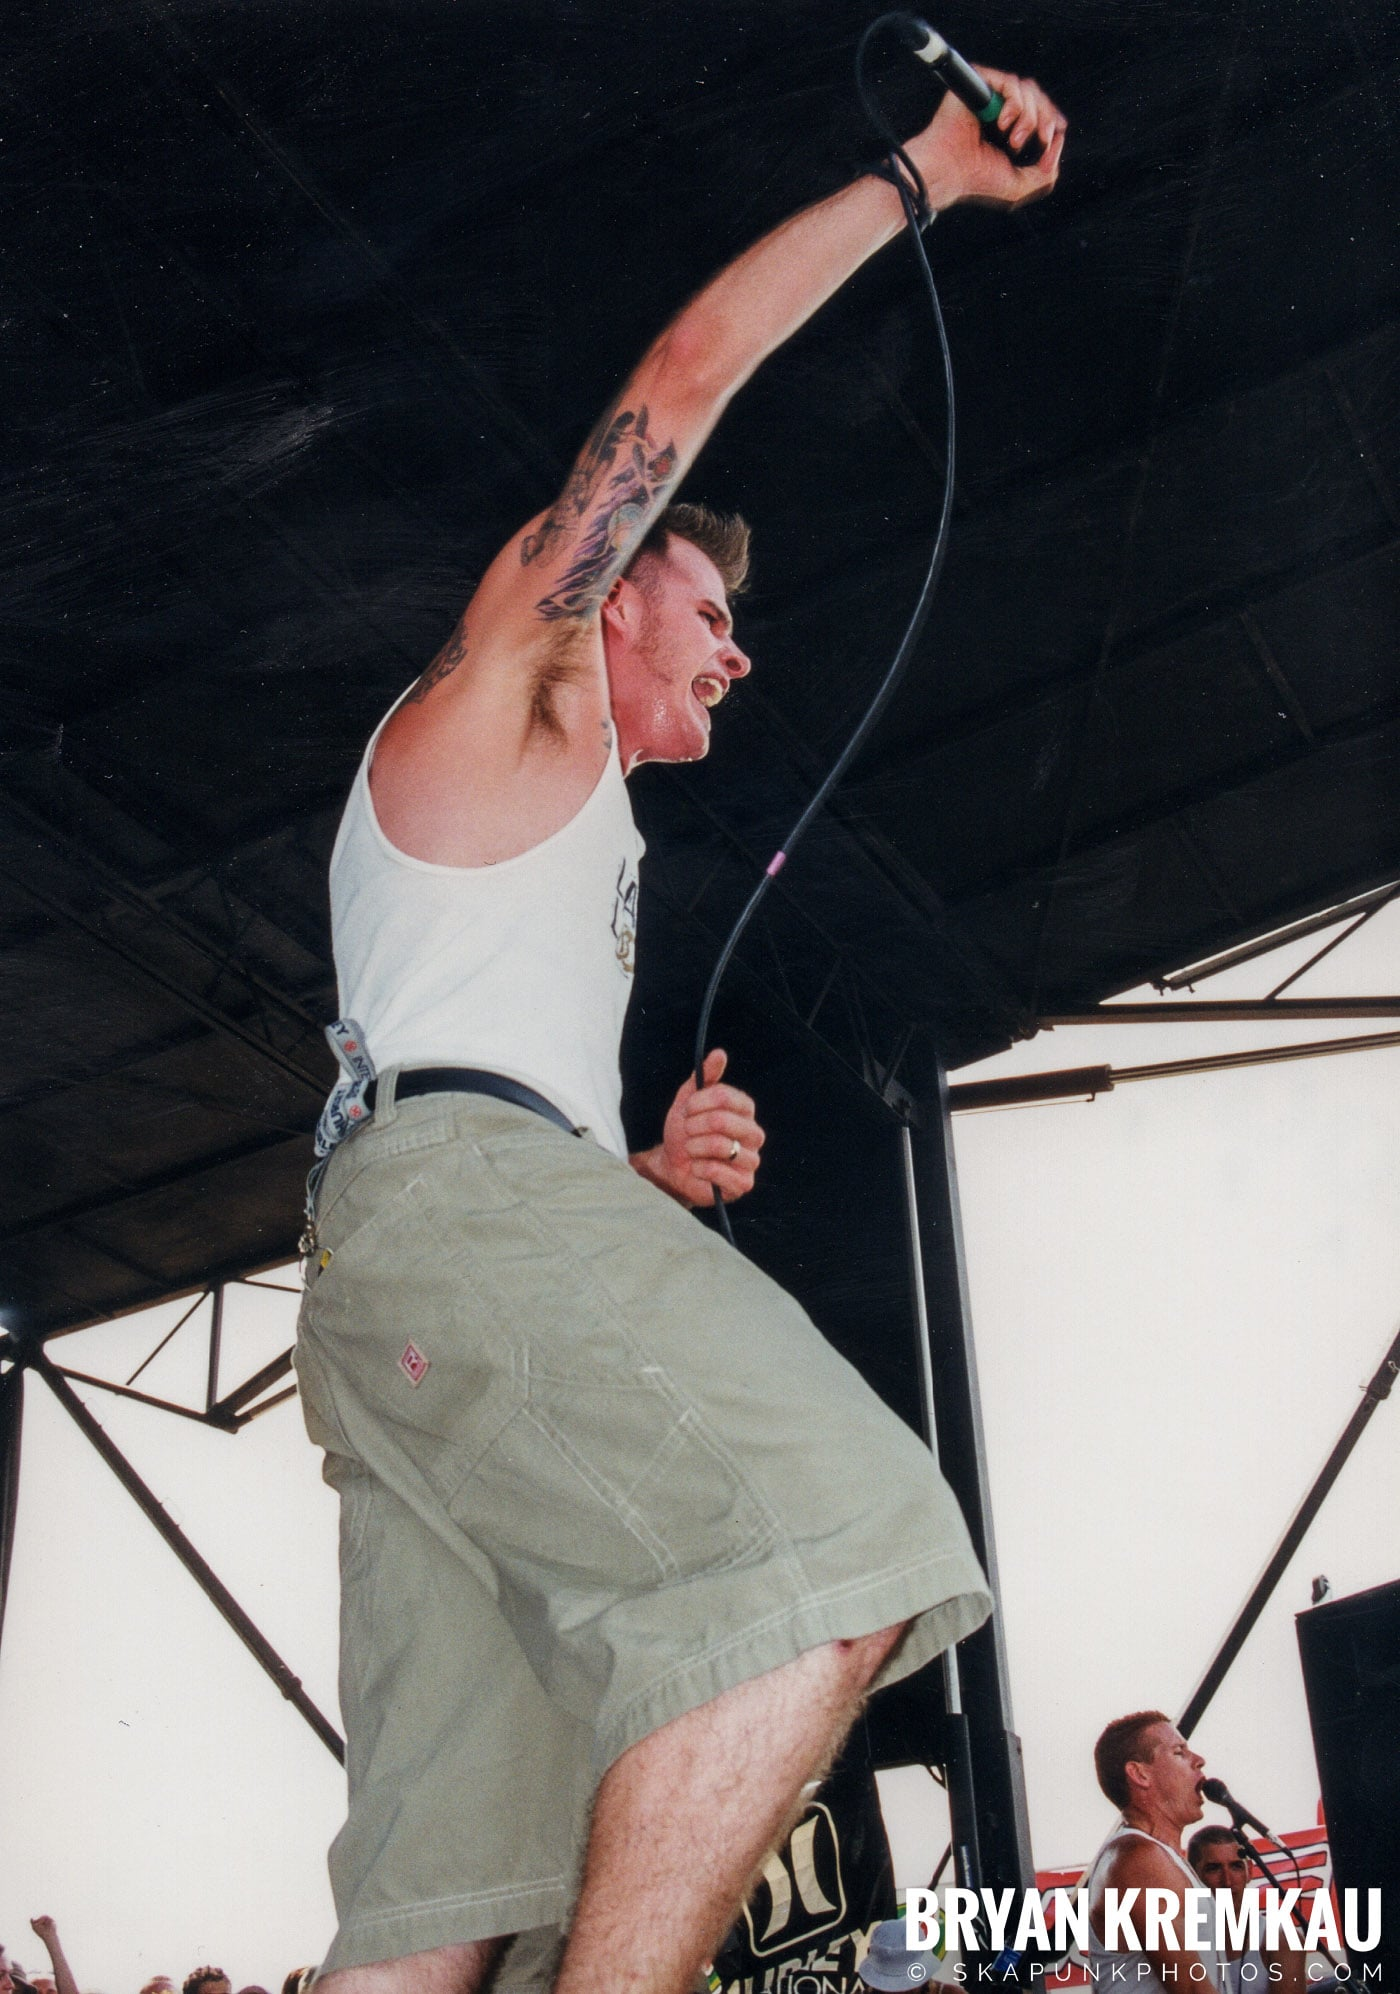 The Dropkick Murphys @ Vans Warped Tour, Randall's Island, NYC - 7.16.99 (7)